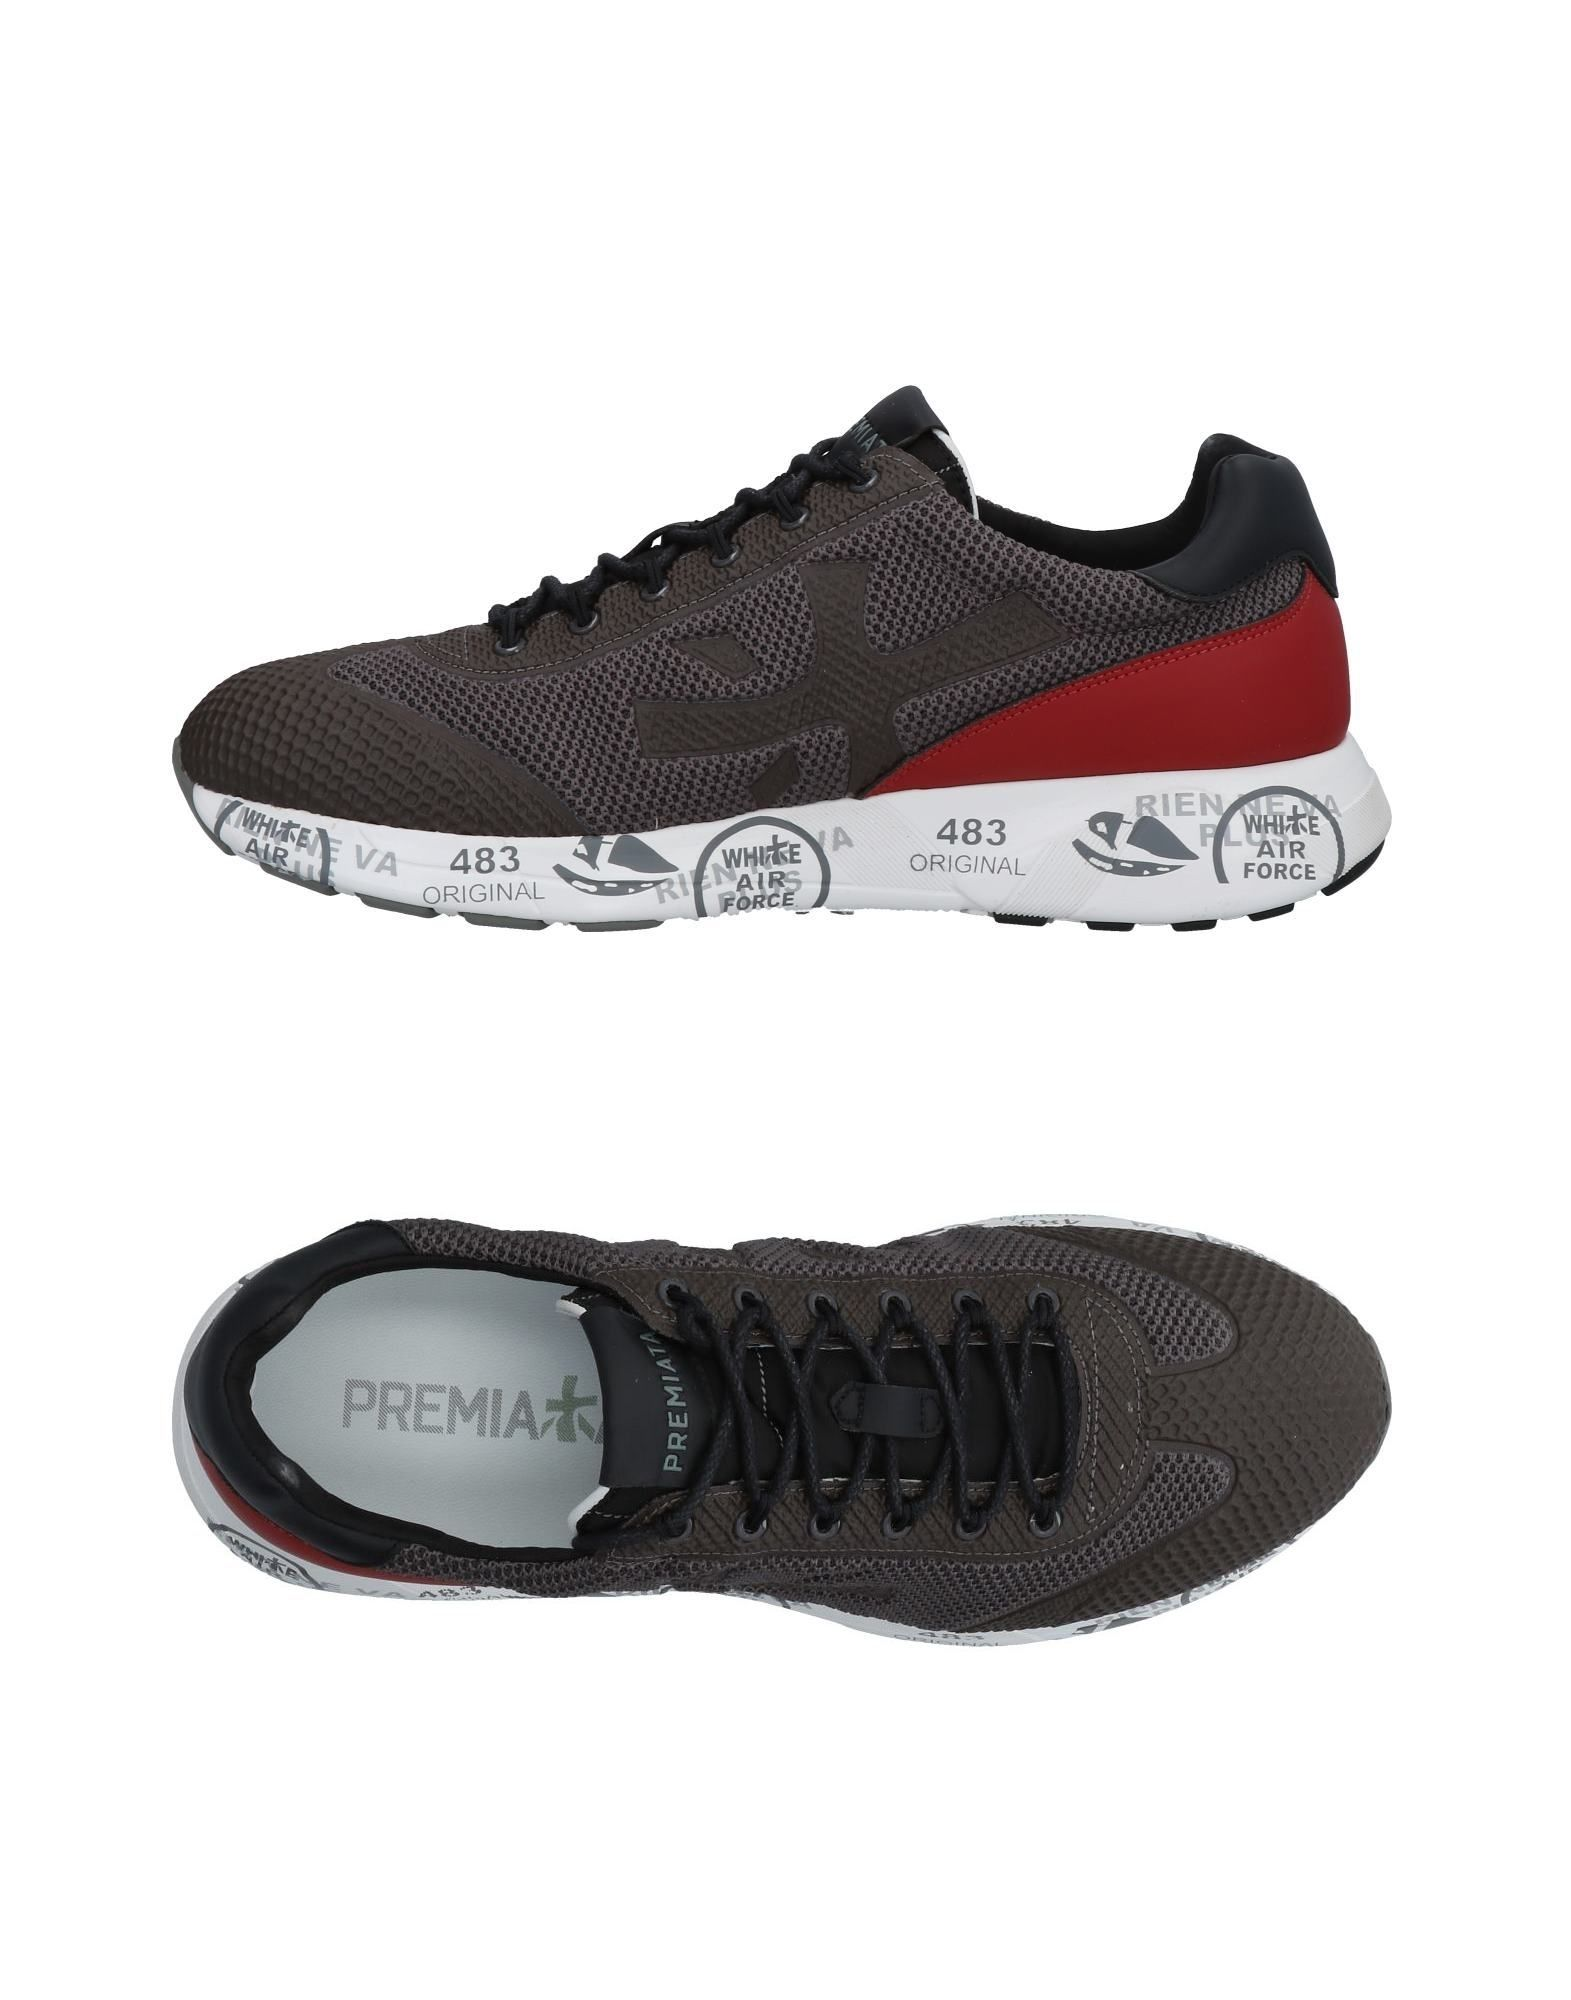 Premiata Sneakers Herren Herren Herren  11484757PO 09f007